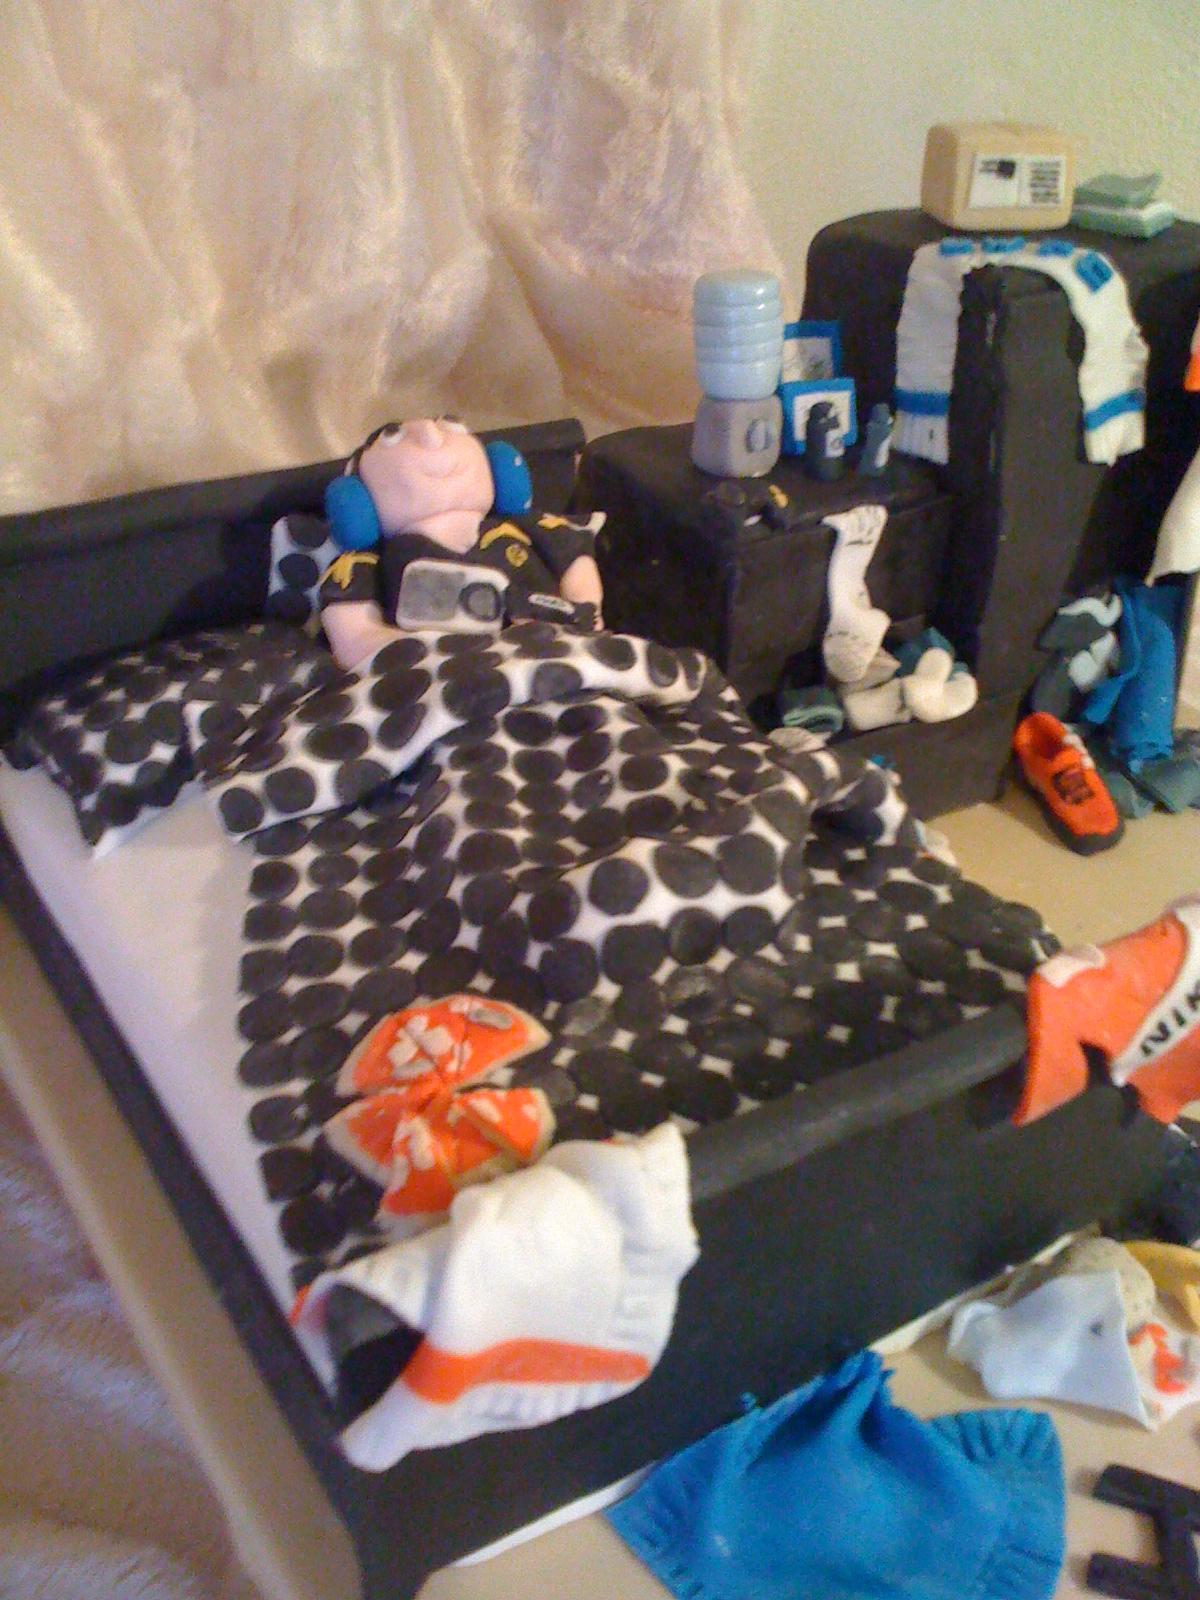 andyasimplechefblogspotcom Messy Boys Bedroom Cake